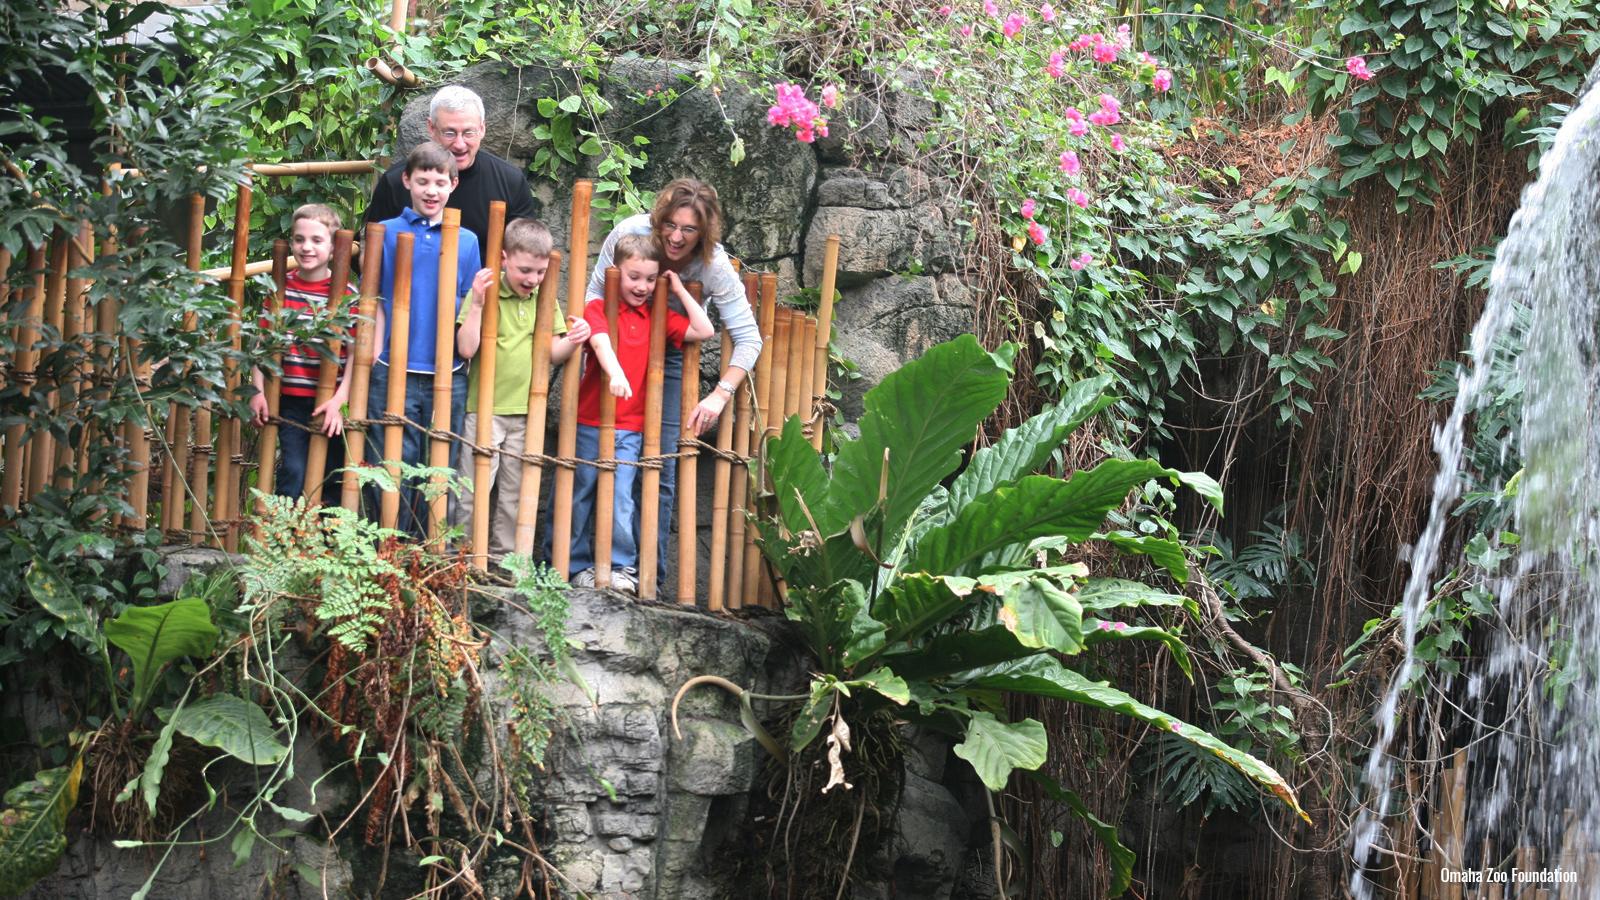 Children at Omaha Zoo